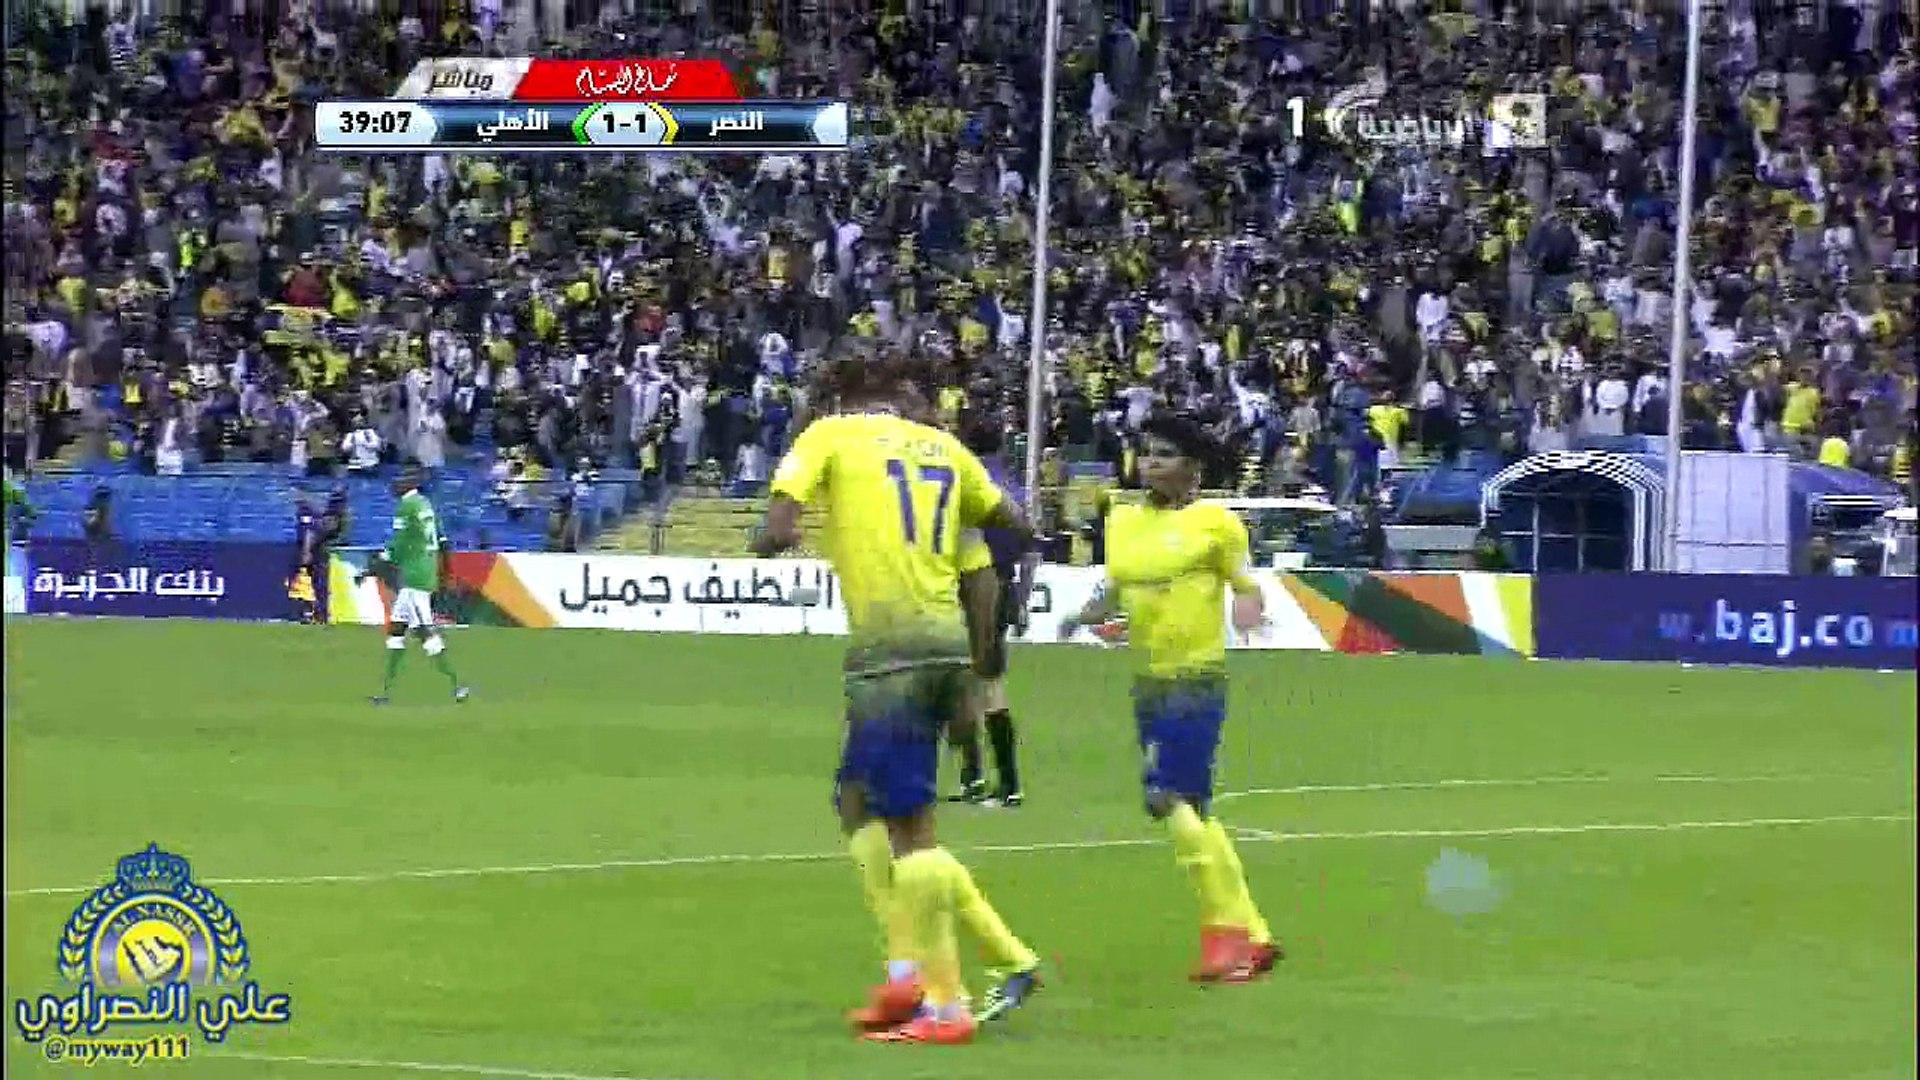 اهداف النصر بطل دوري 2013 2014 فيديو Dailymotion